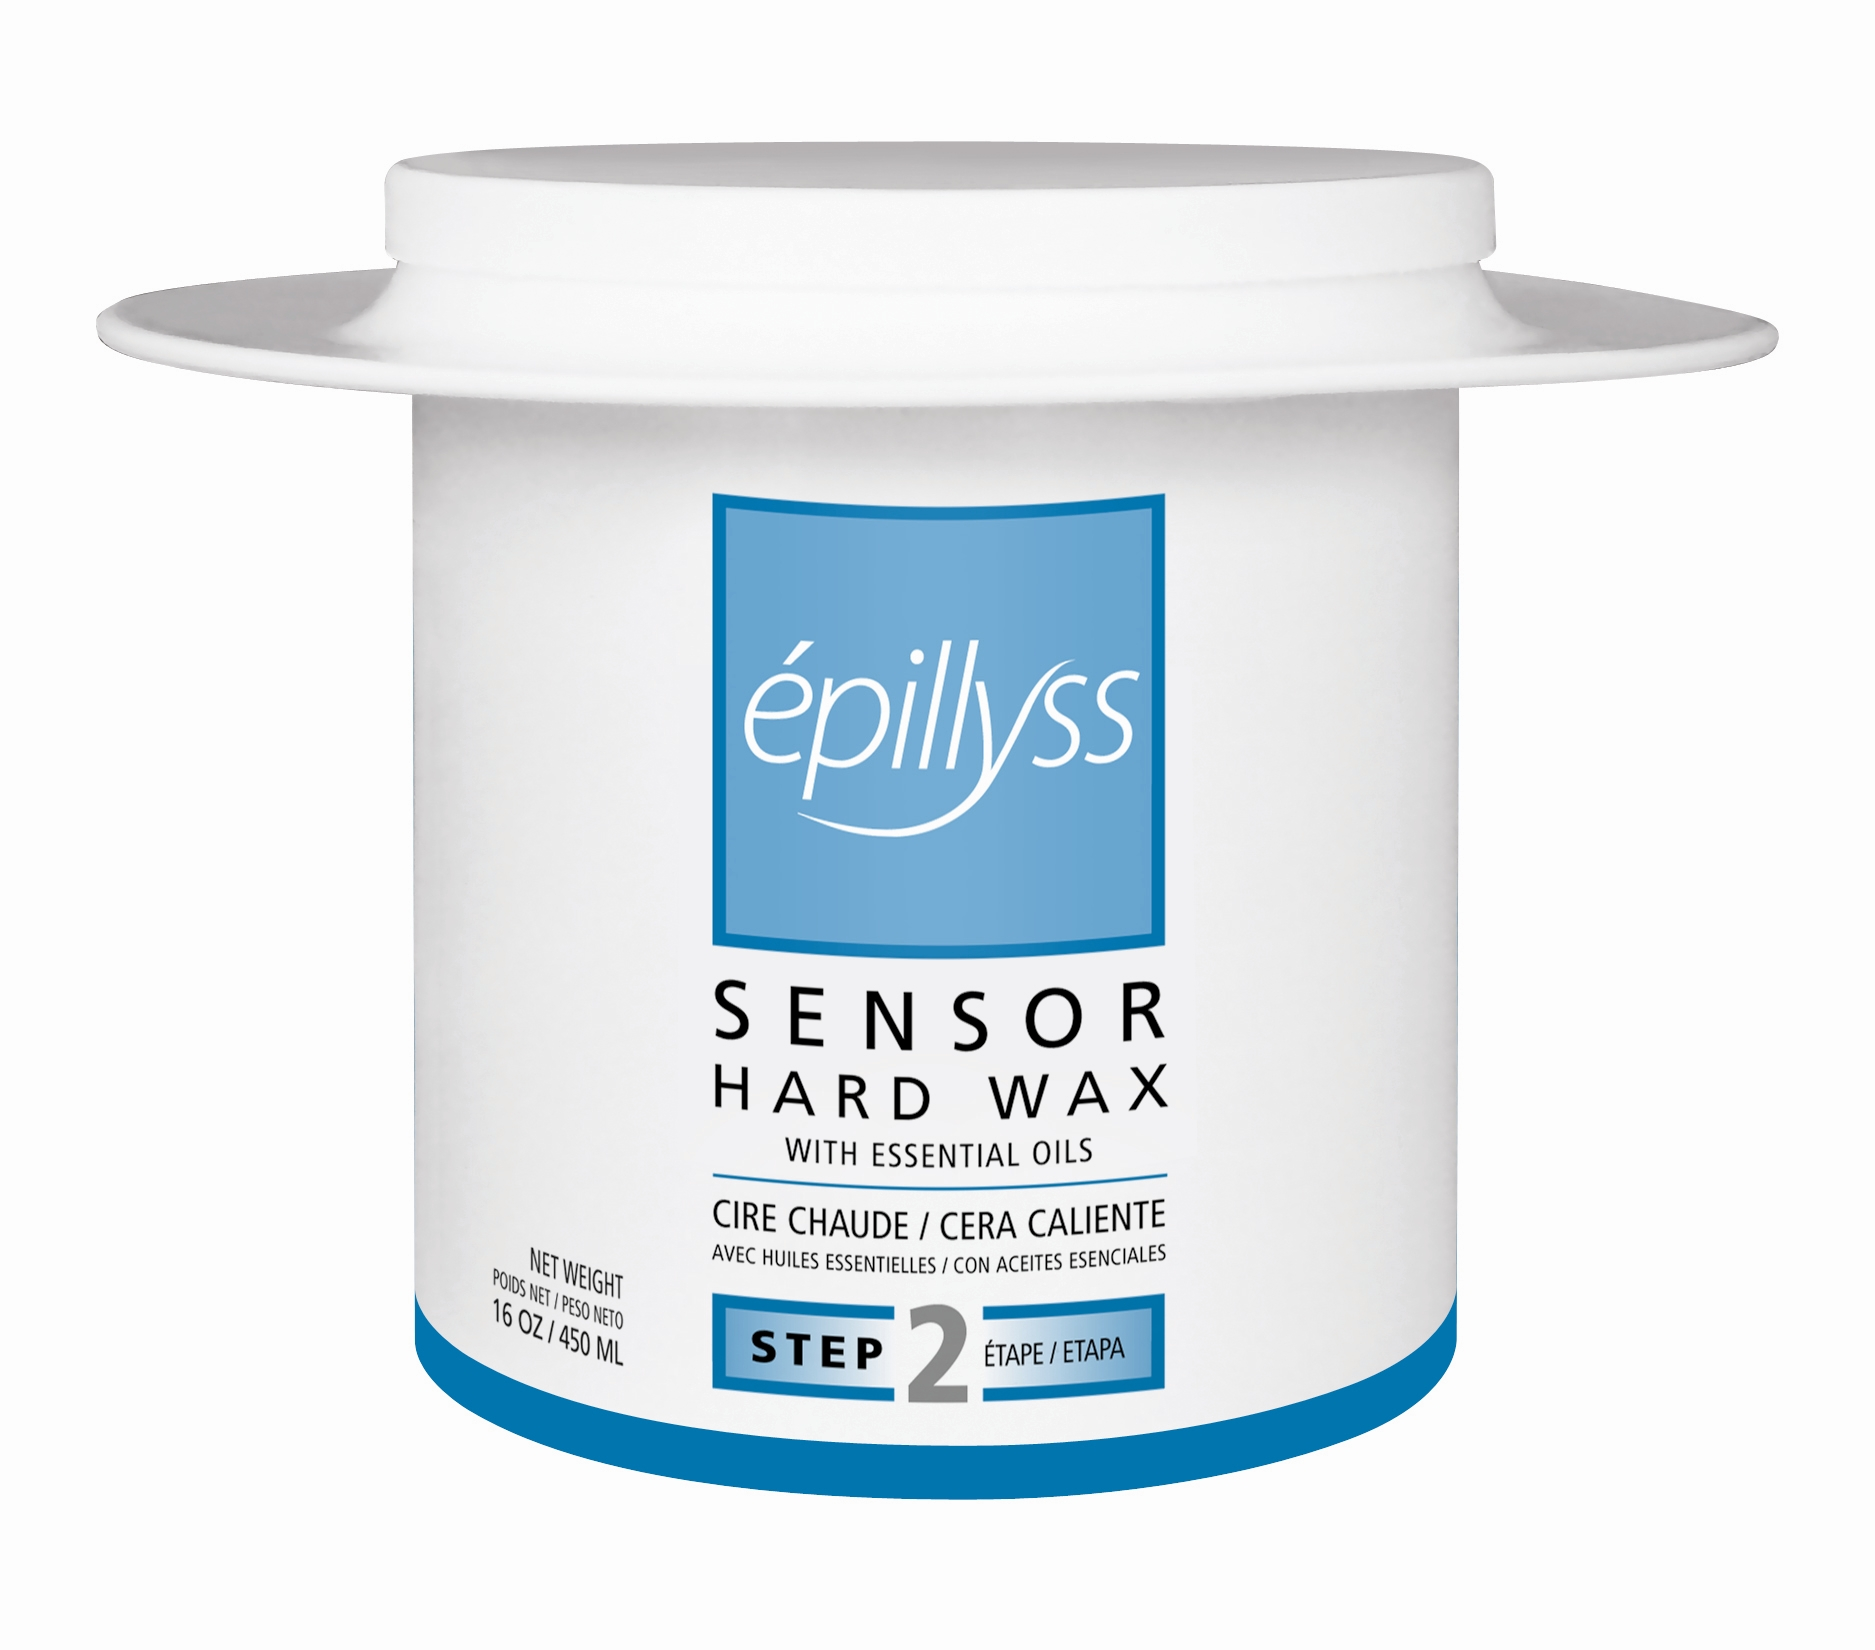 Epillyss HardWax16oz Sensor S2.jpg